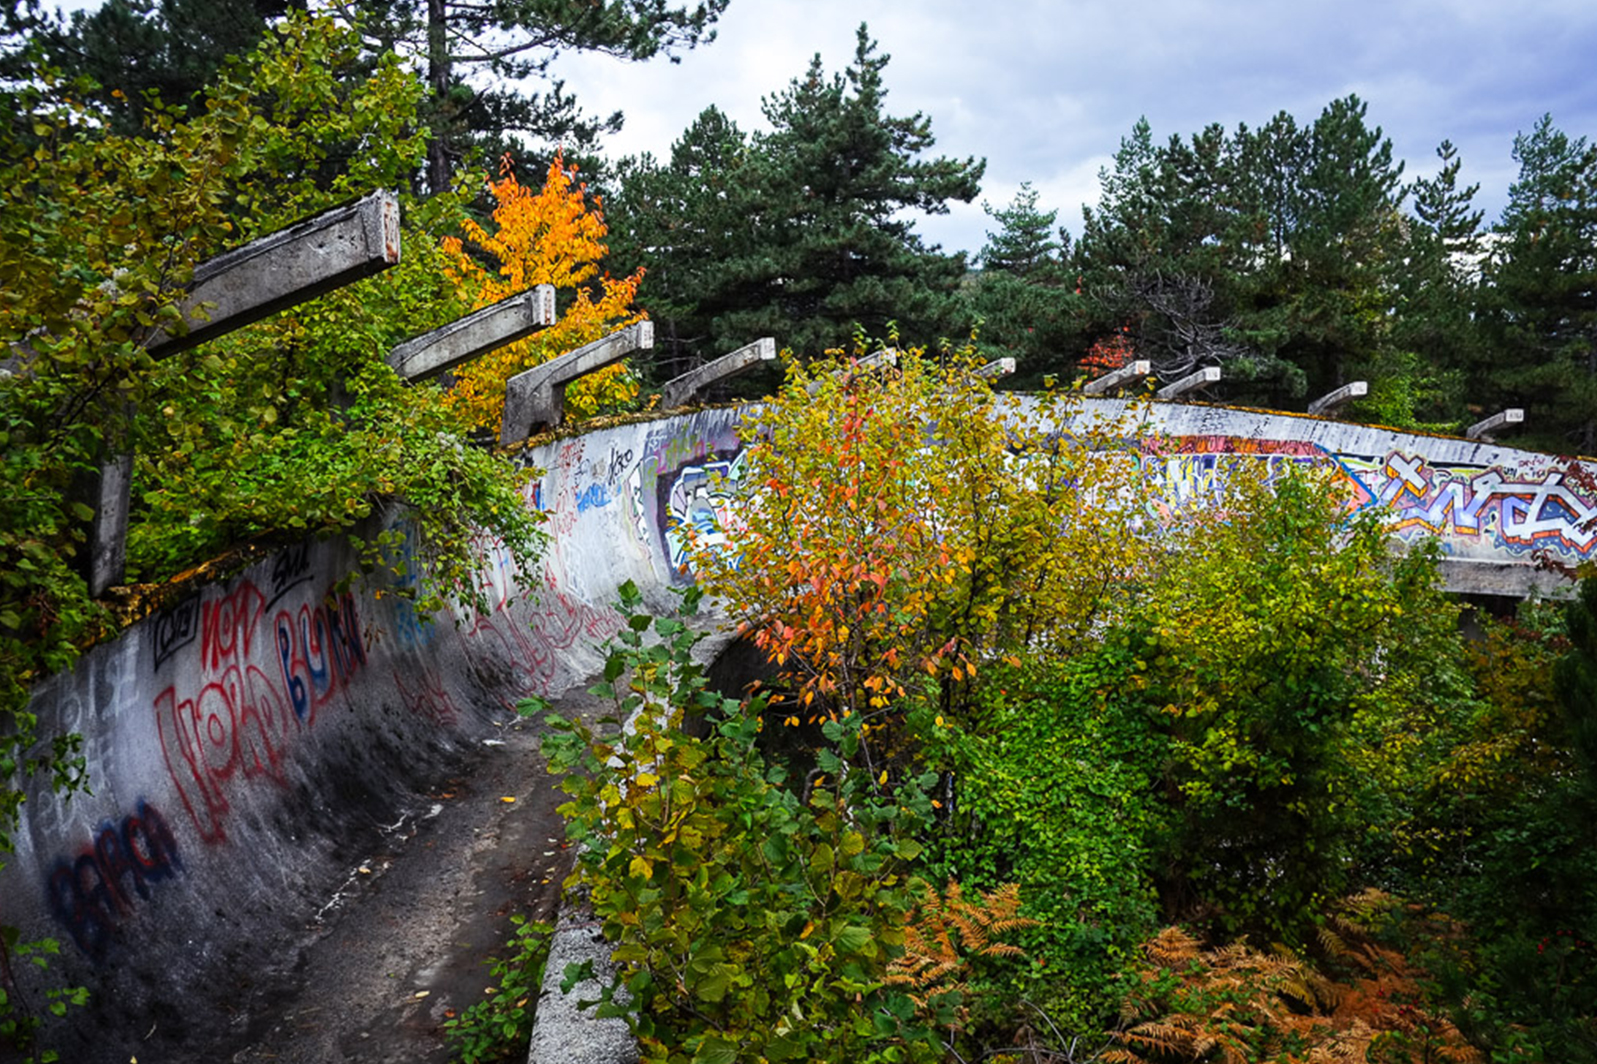 jo sarajevo bobsleigh piste abandon - Berlin, Sarajevo, Athènes : les sites des Jeux Olympiques version urbex